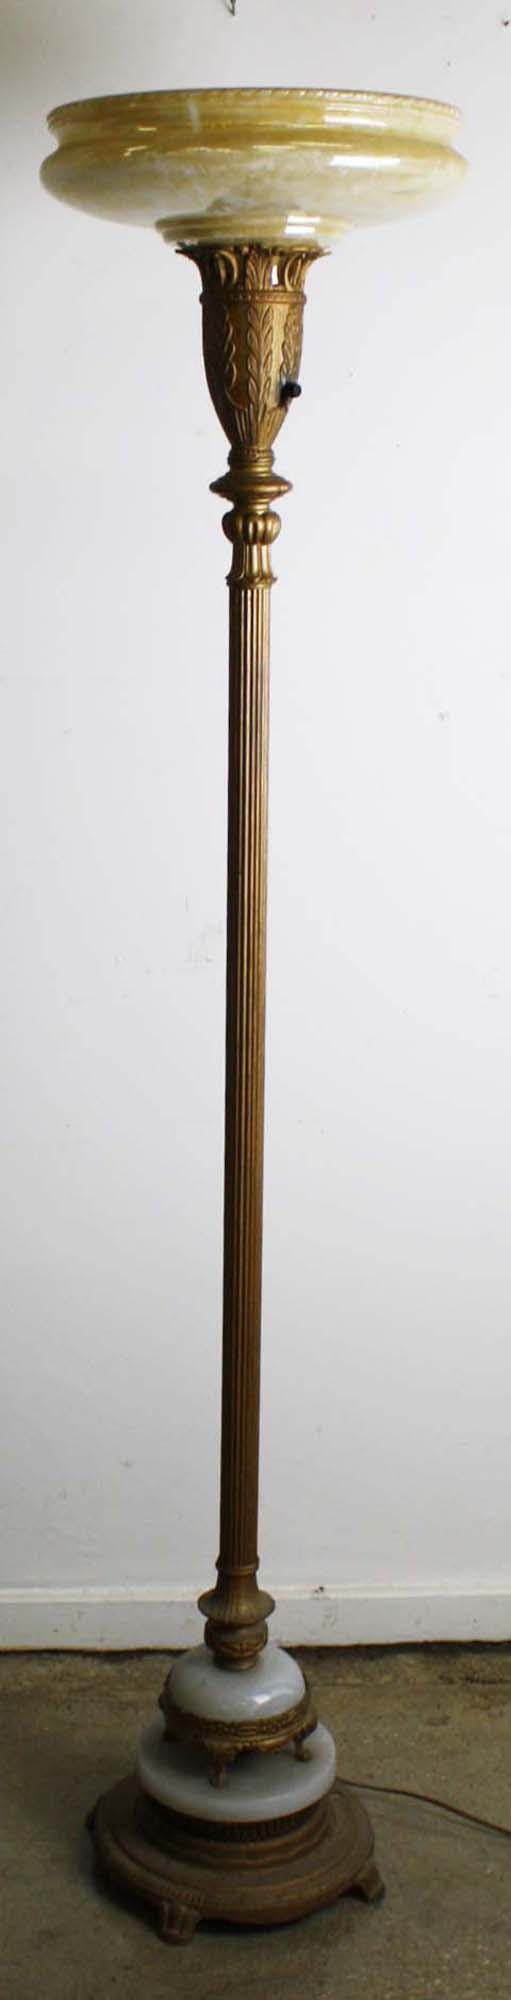 1920 S Onyx Base White Metal Floor Lamp